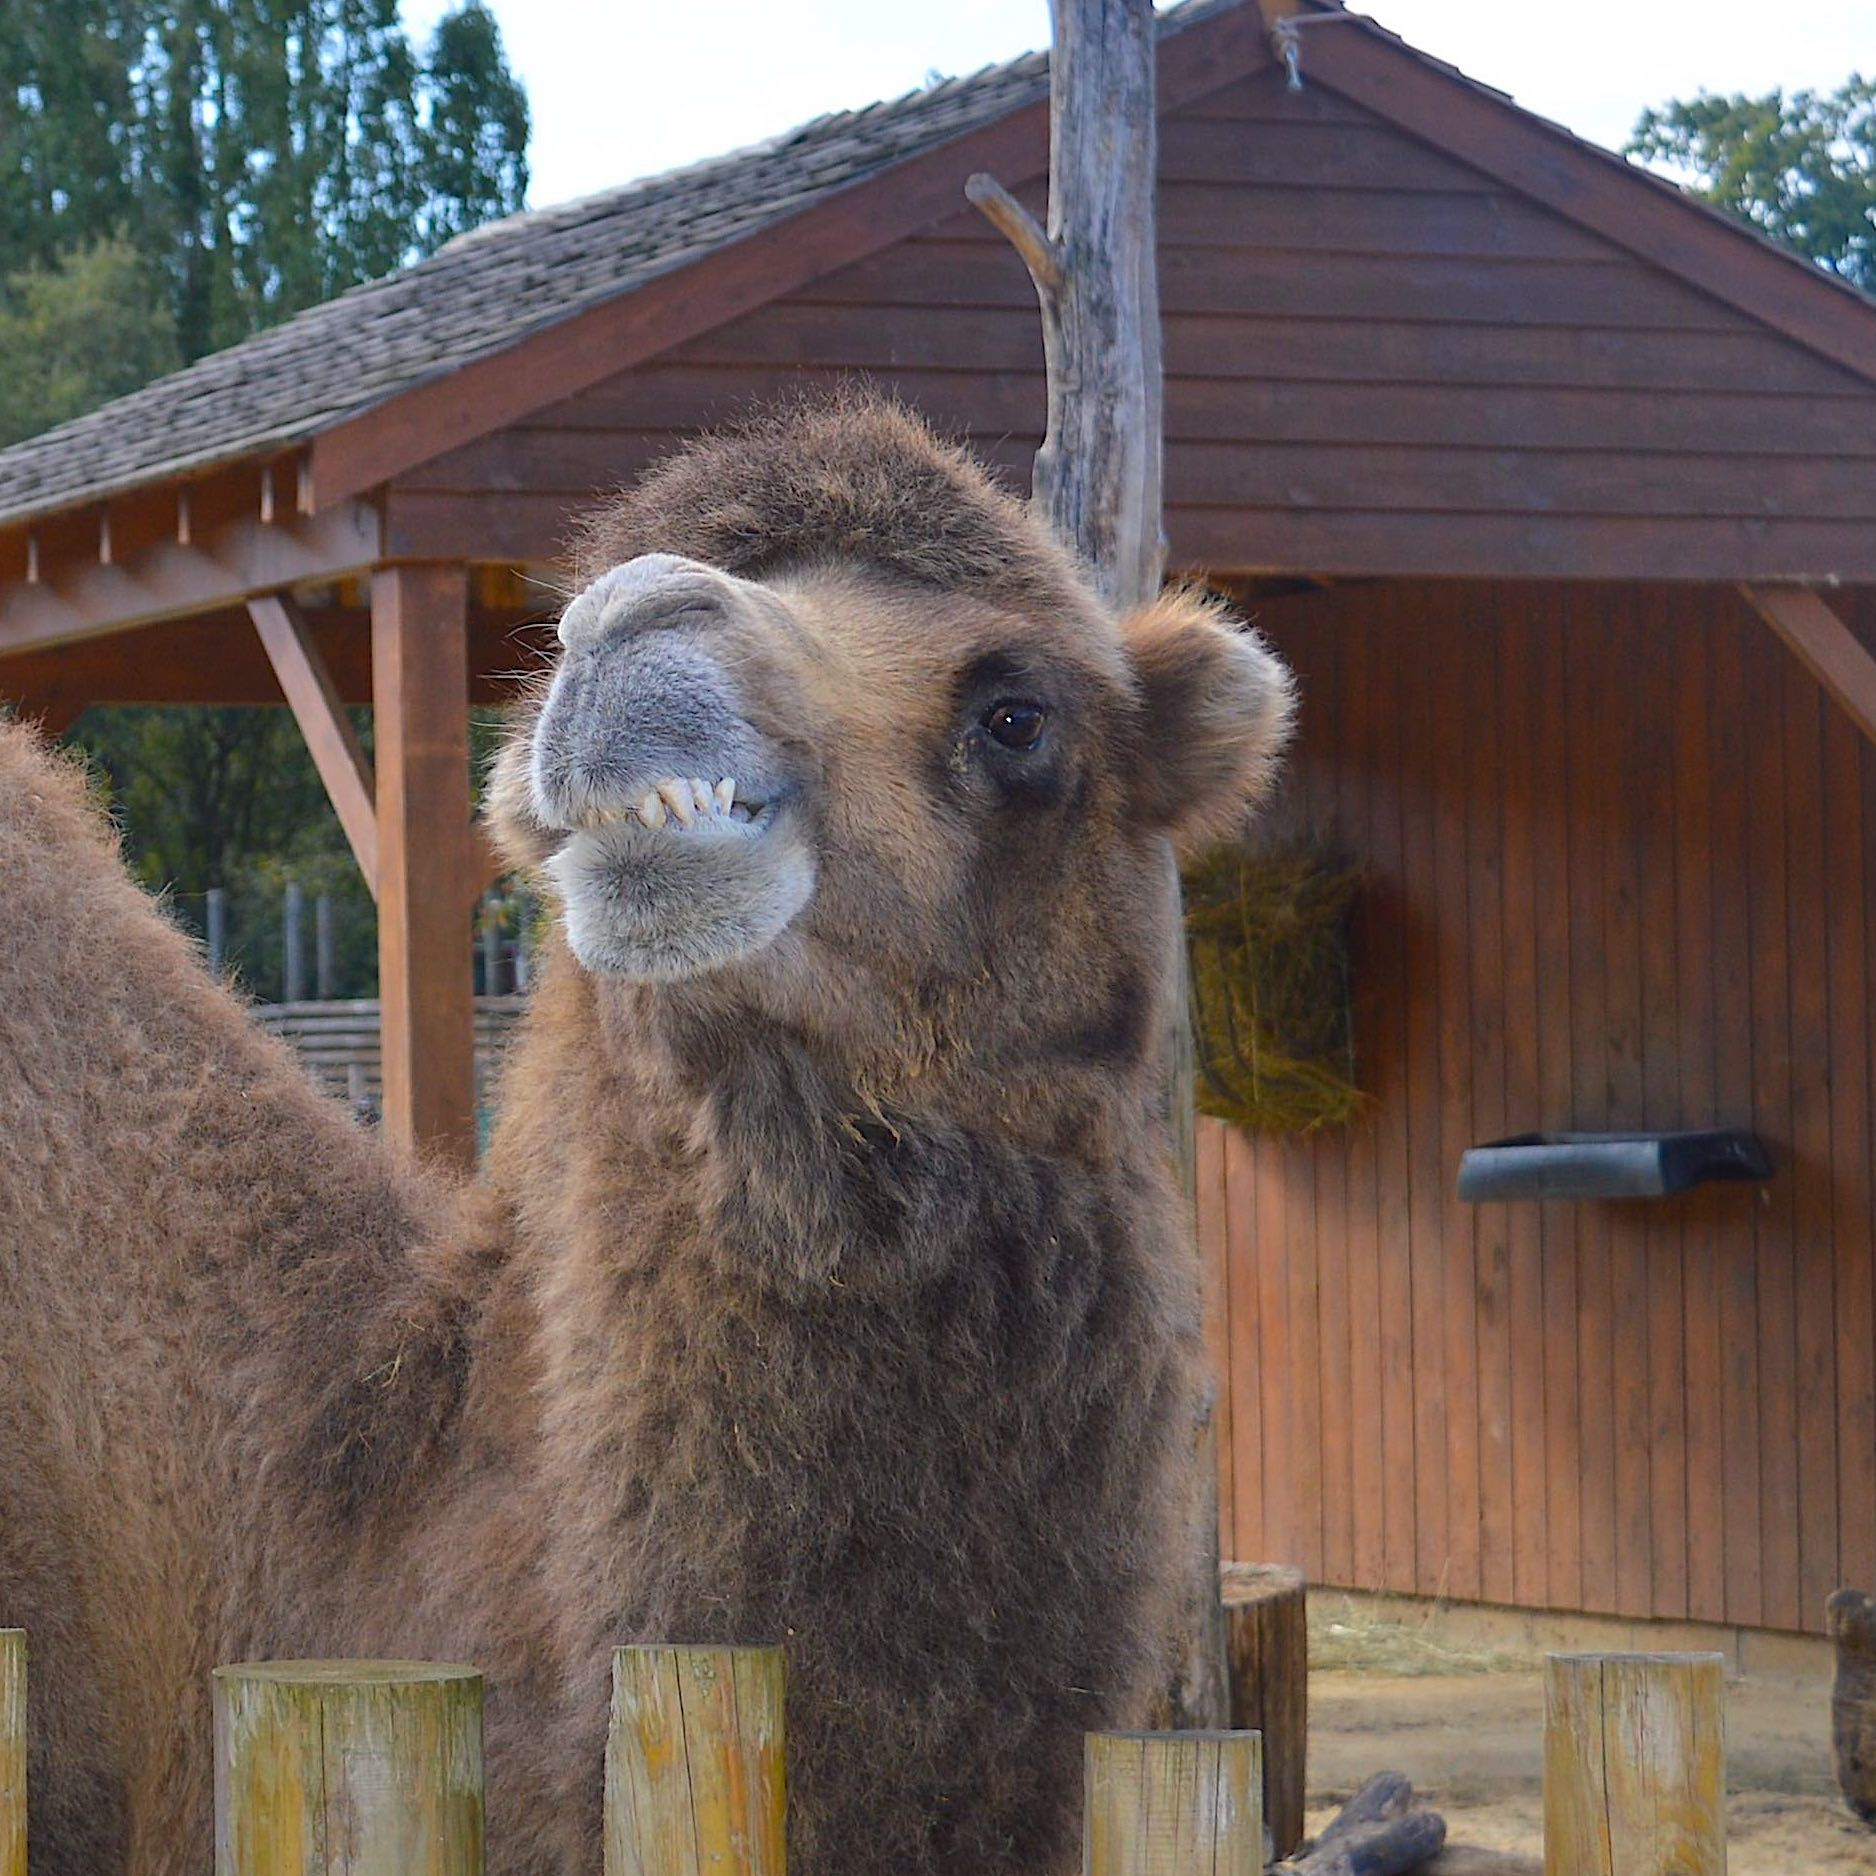 Paradise Wildlife Park Camel Smile